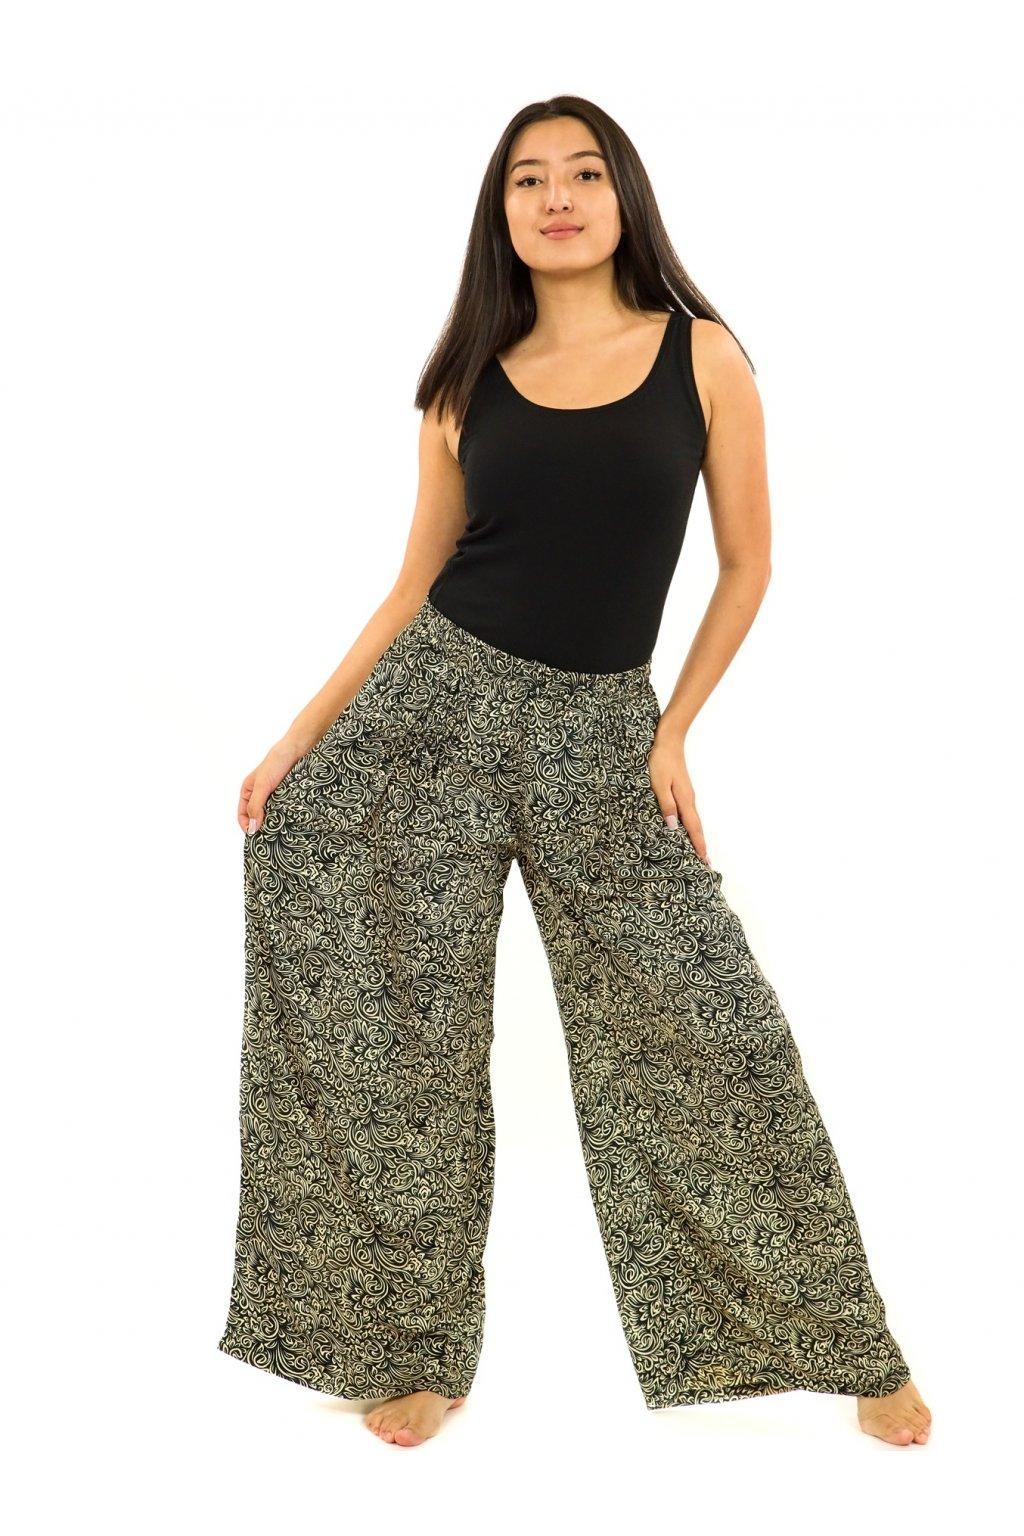 Široké kalhoty Shanti - černá s béžovou